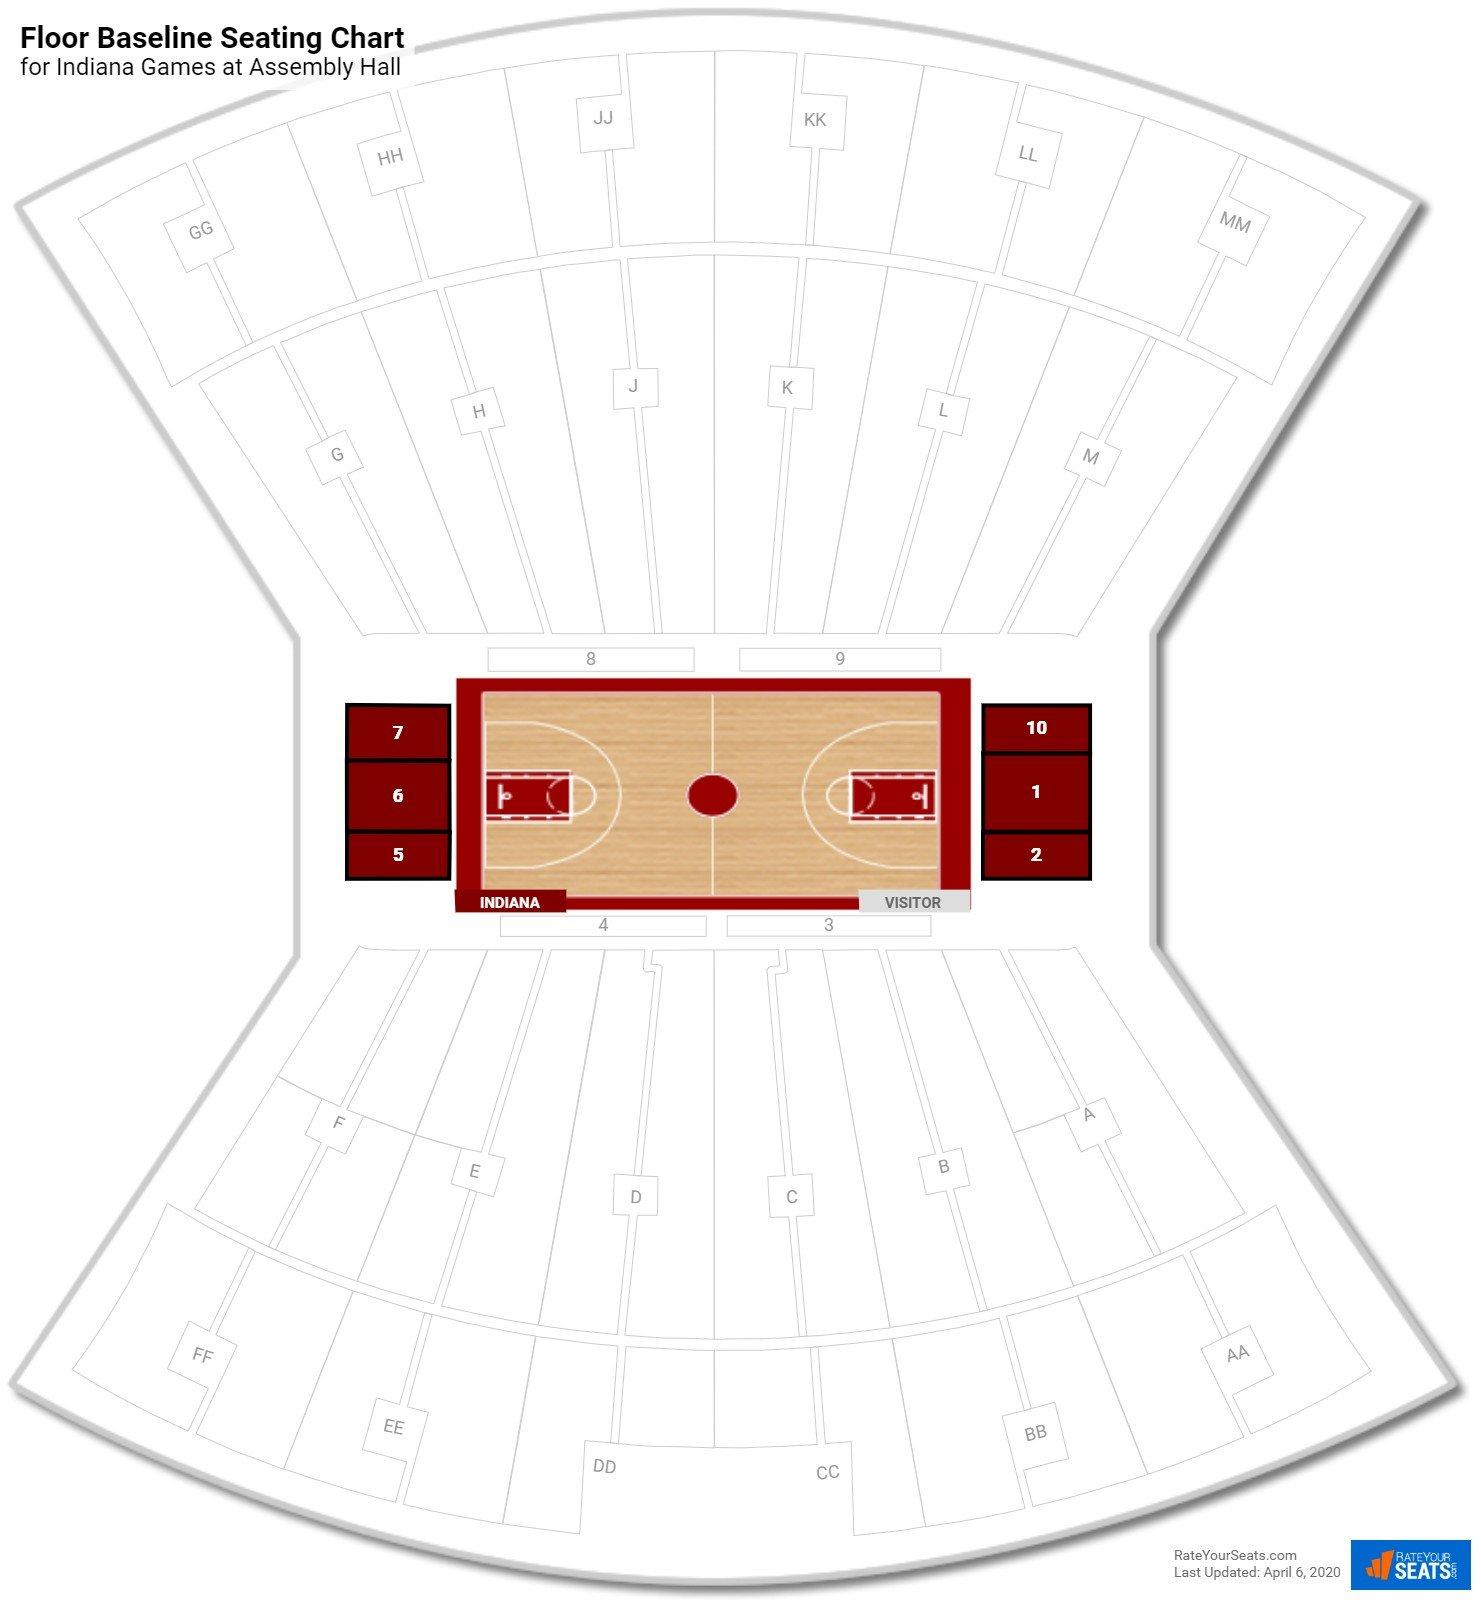 Embly Hall Floor Baseline Seating Chart